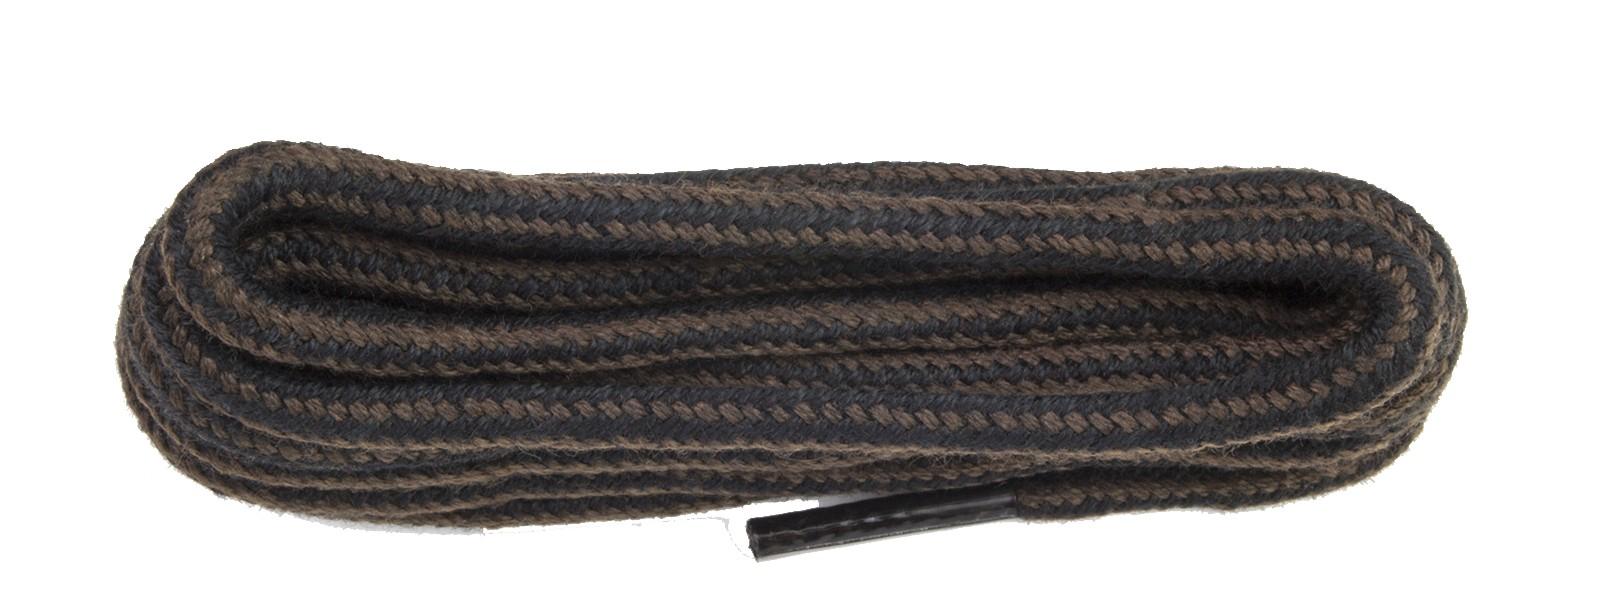 Kicker Brown/black Round Cord Laces